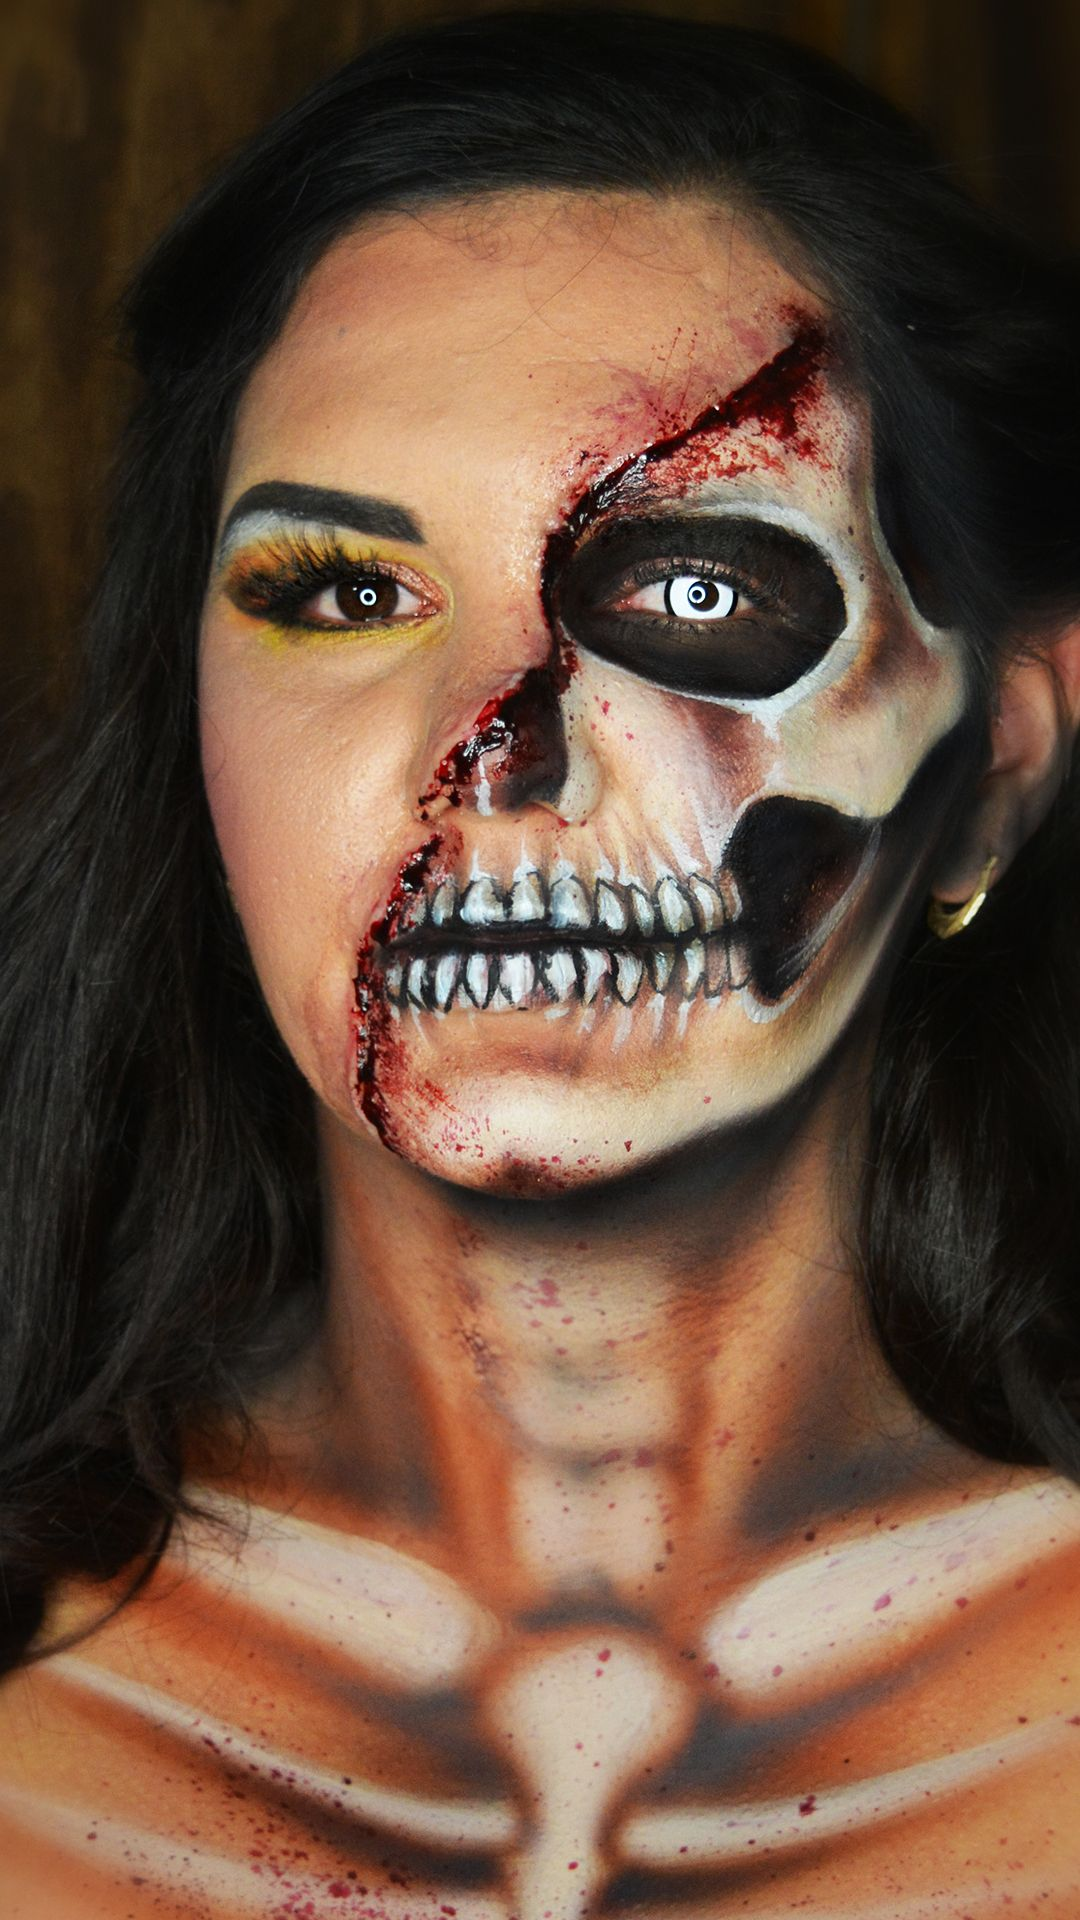 HALF SKULL MAKEUP in 2020 Half skull makeup, Skull